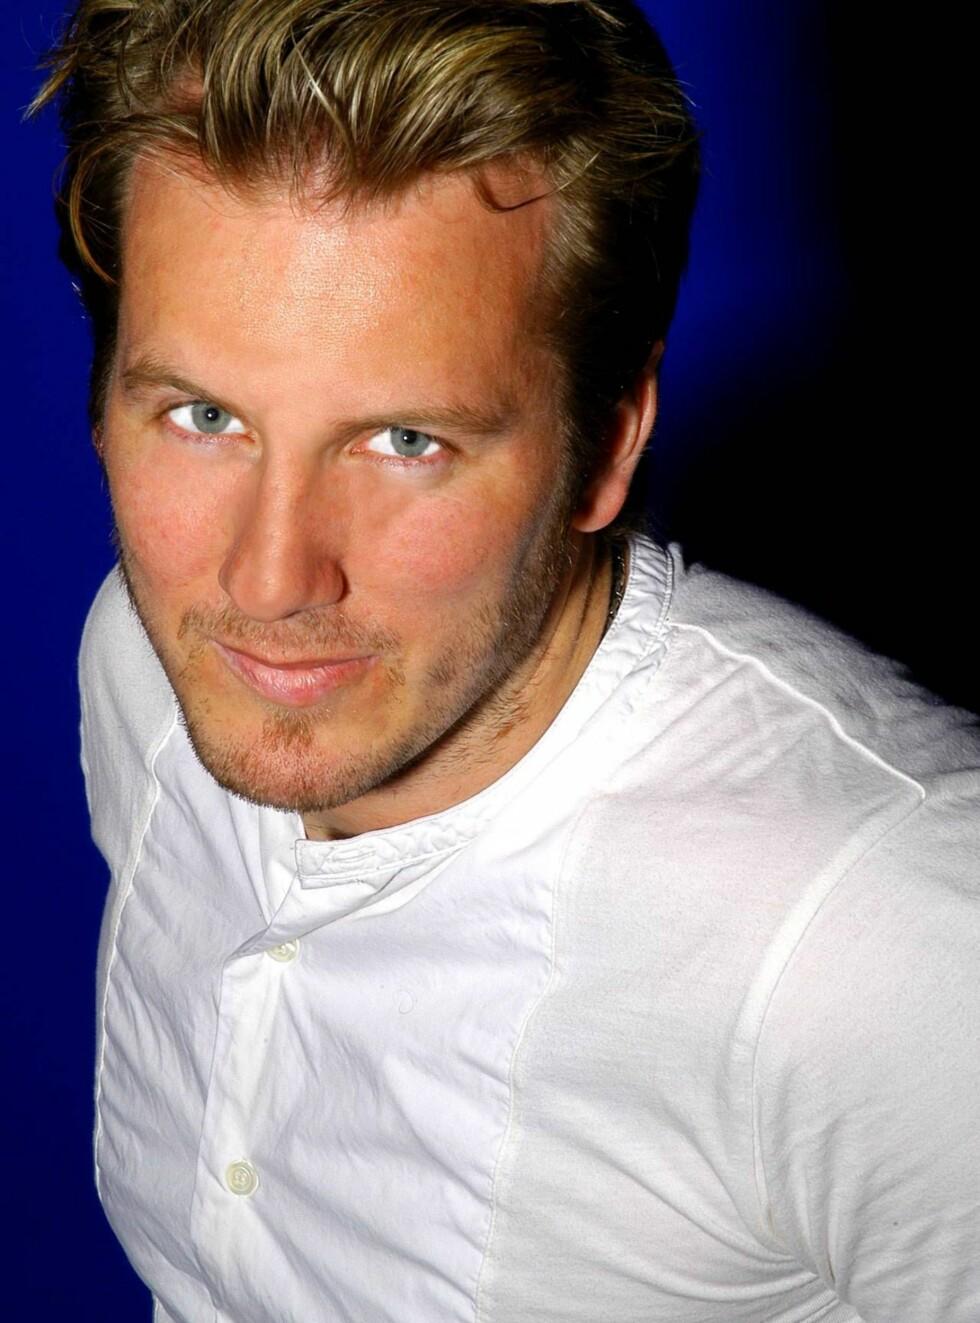 TVILLINGPAPPA: Det er slutt på ungkarslivet for Max Marius Almaas. Foto: TVNorge